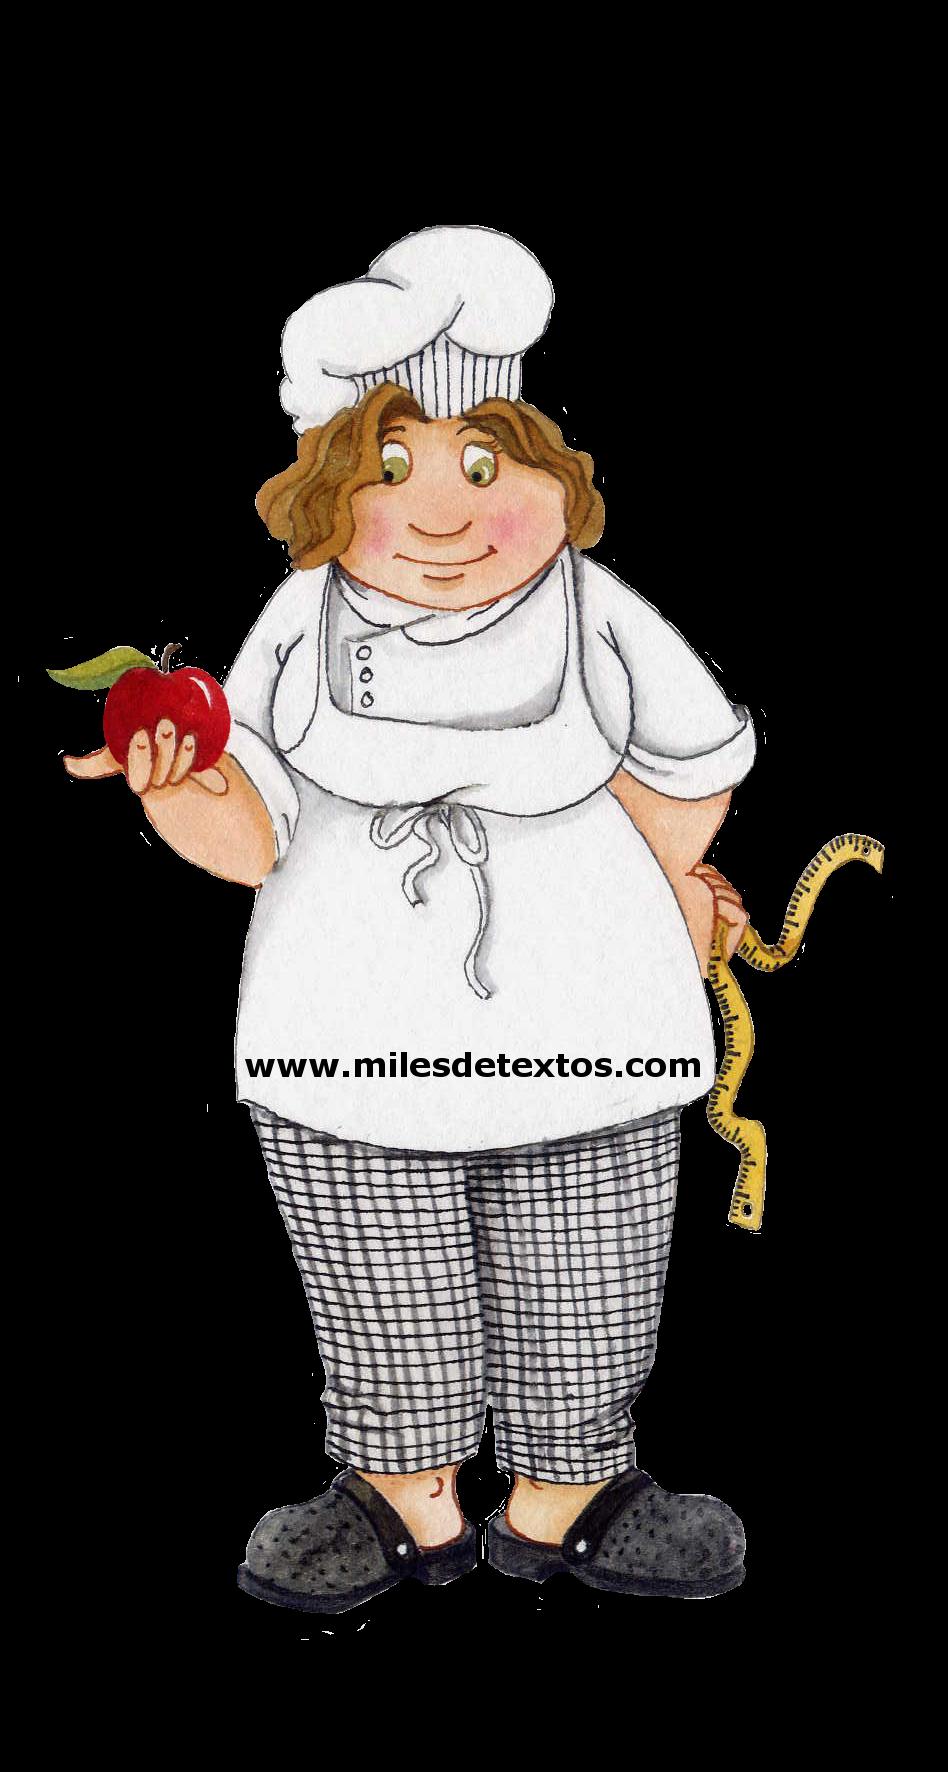 Cocinera-www.milesdetextos.com